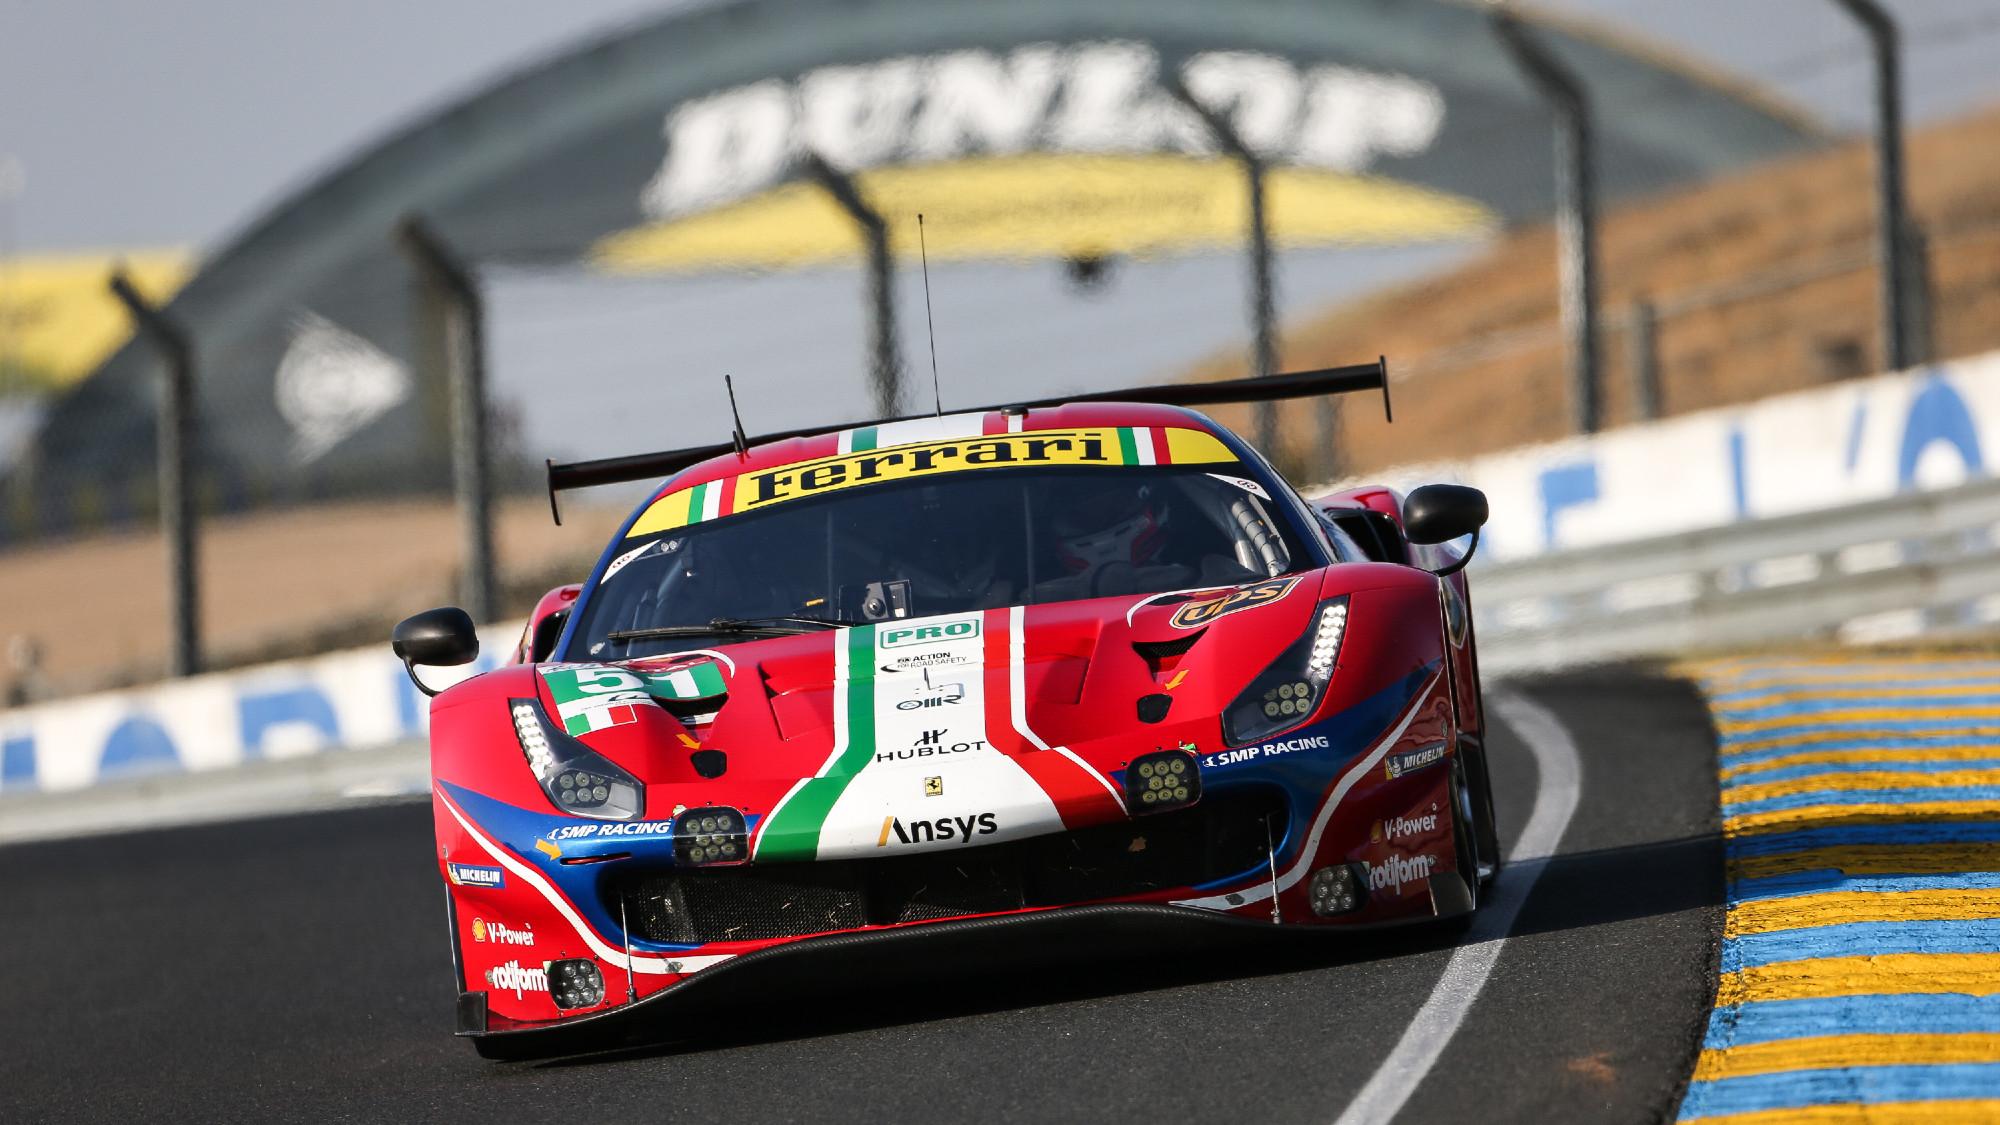 Ferrari, Le Mans 2020